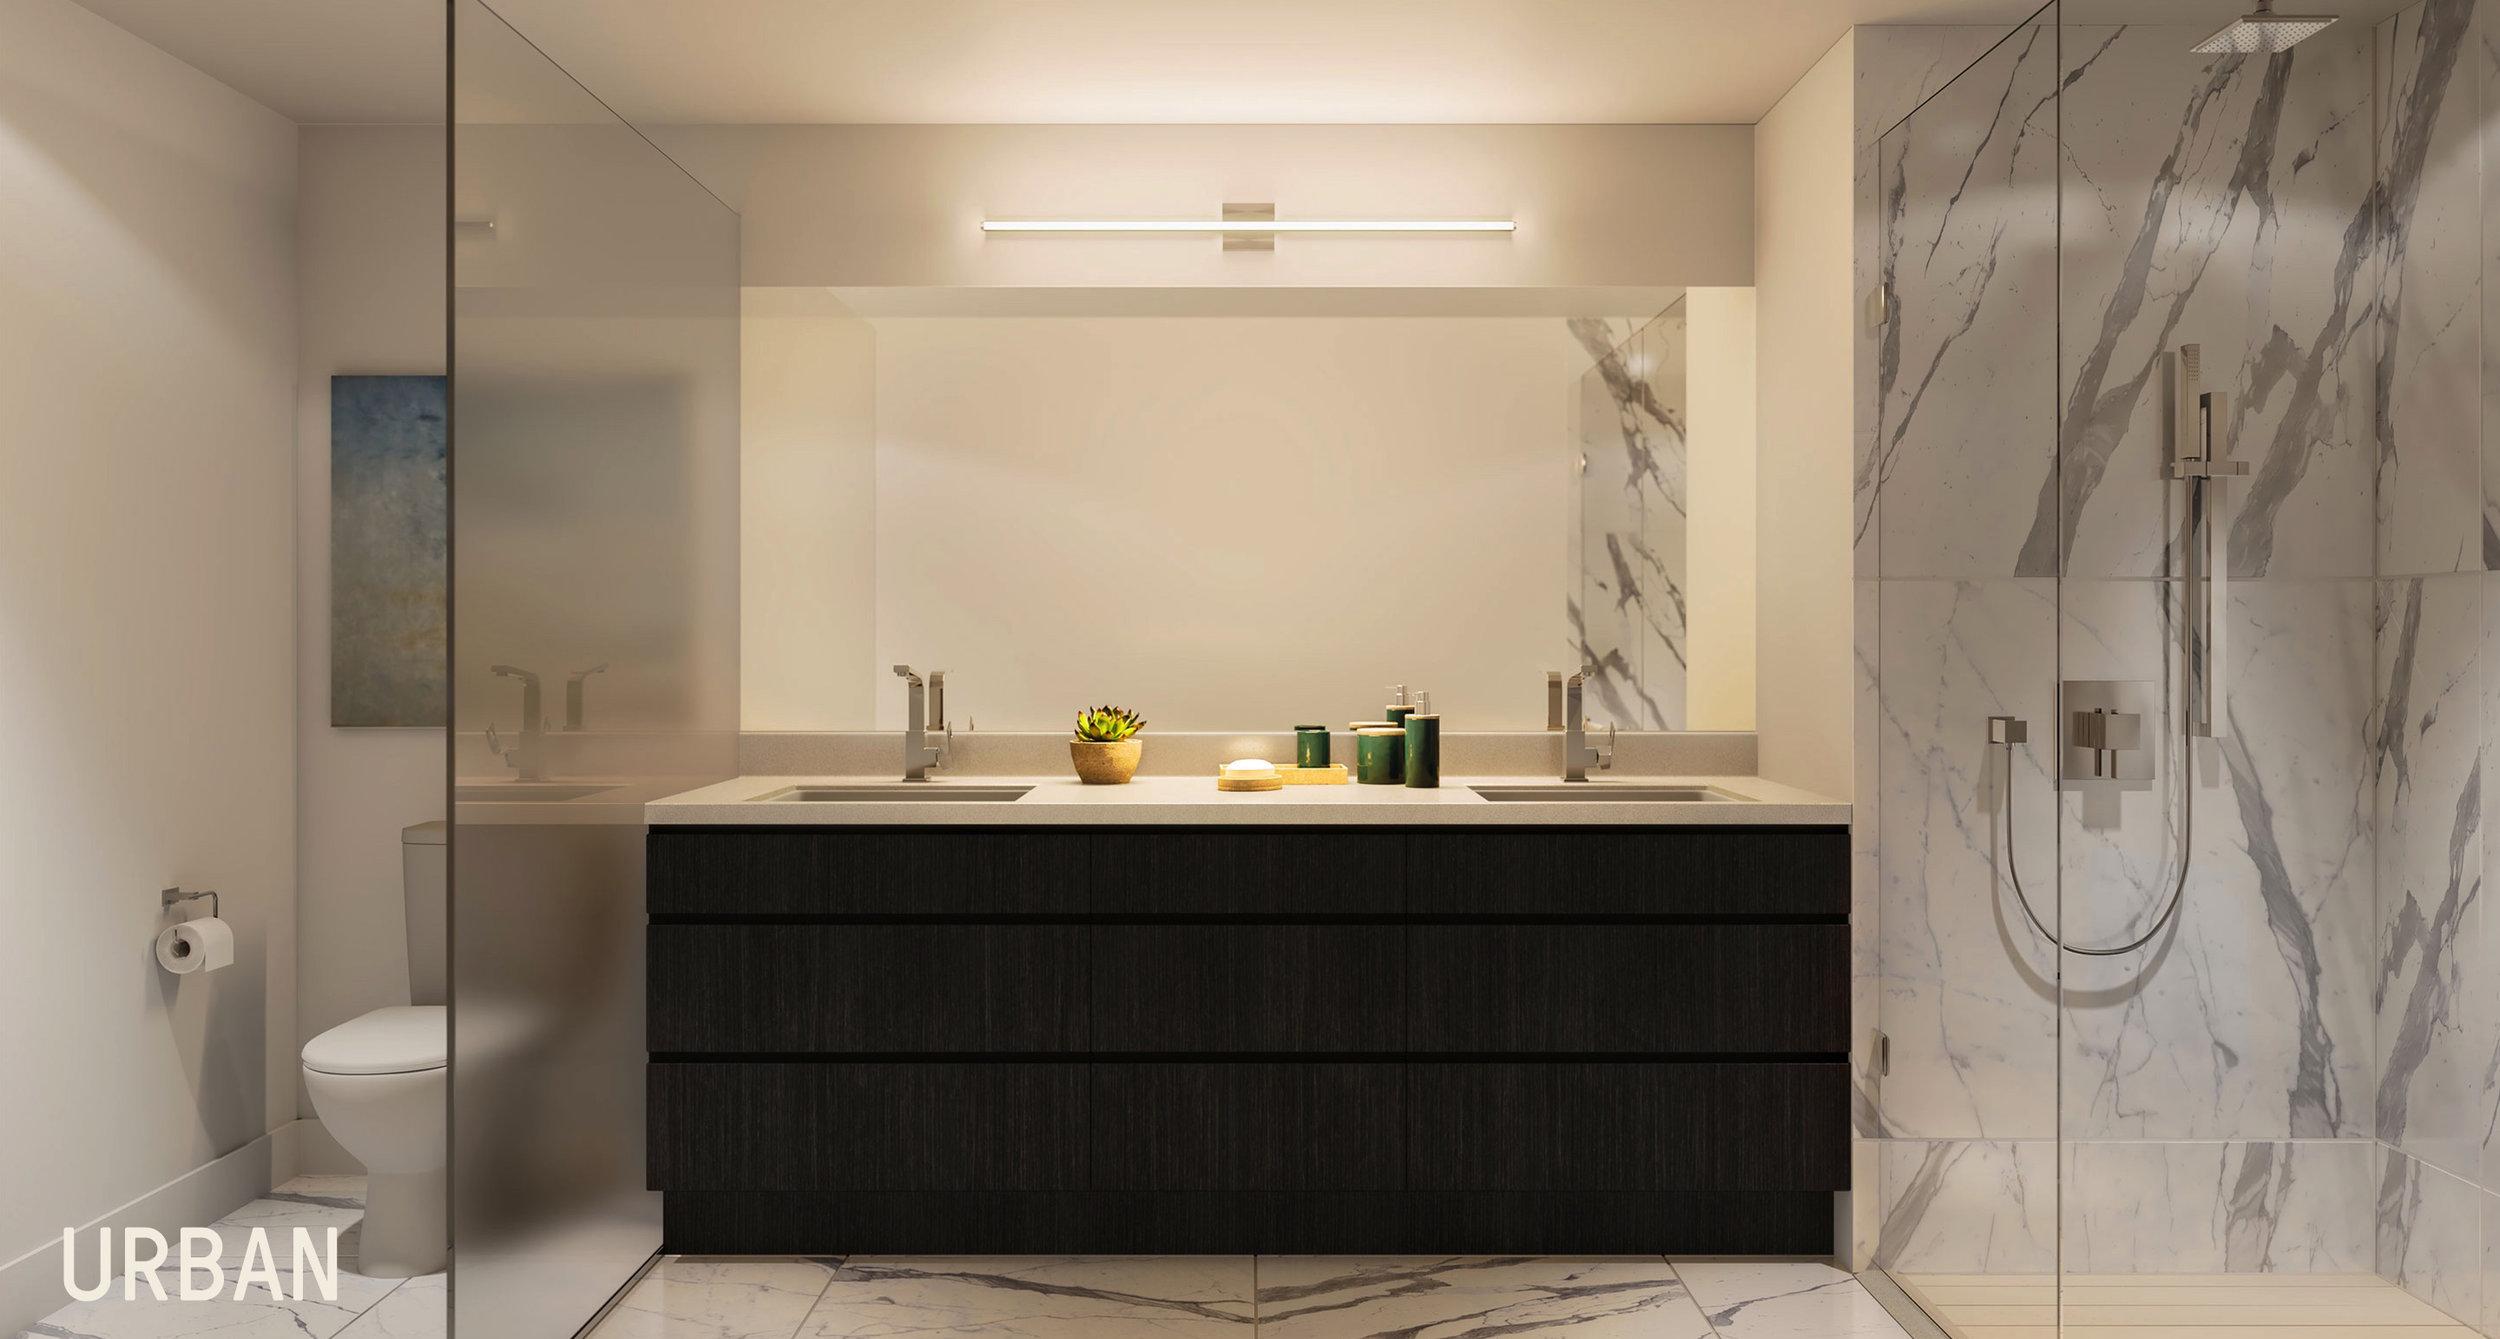 Savina_bathroom_urban.jpg